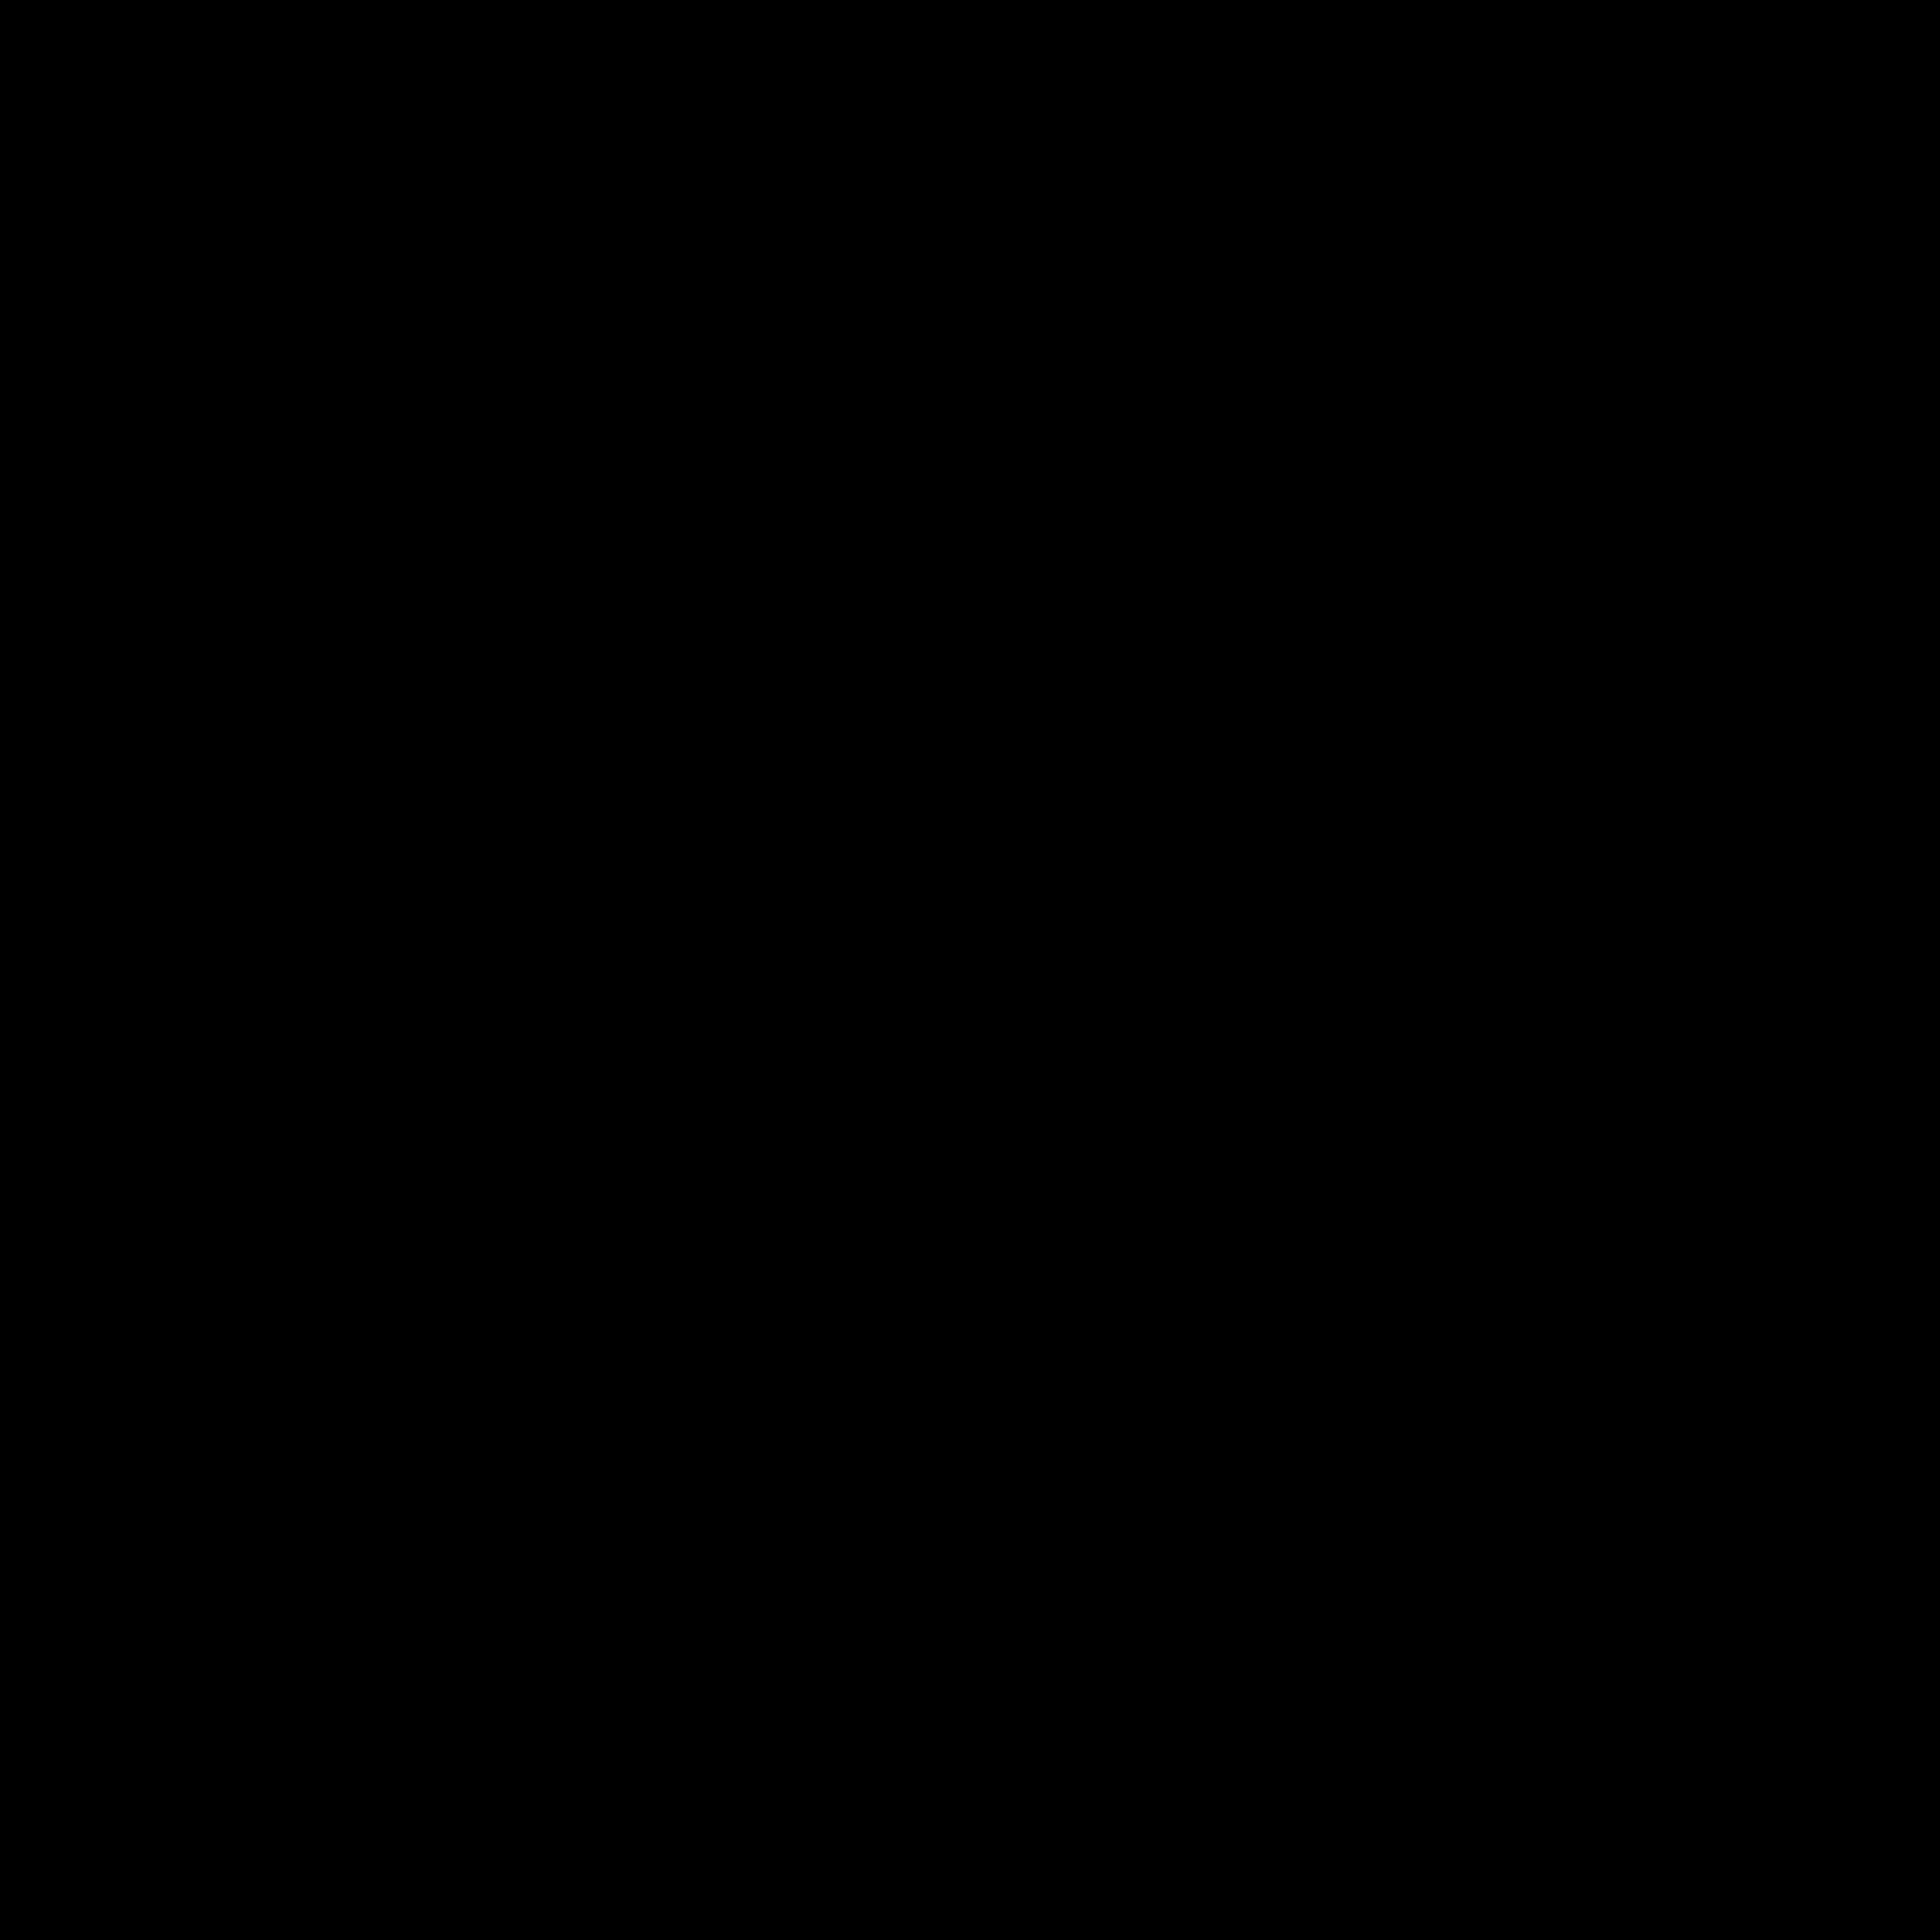 dolby laboratories dolby digital logo png transparent svg vector rh freebiesupply com dolby digital logo vector dolby digital logo vector